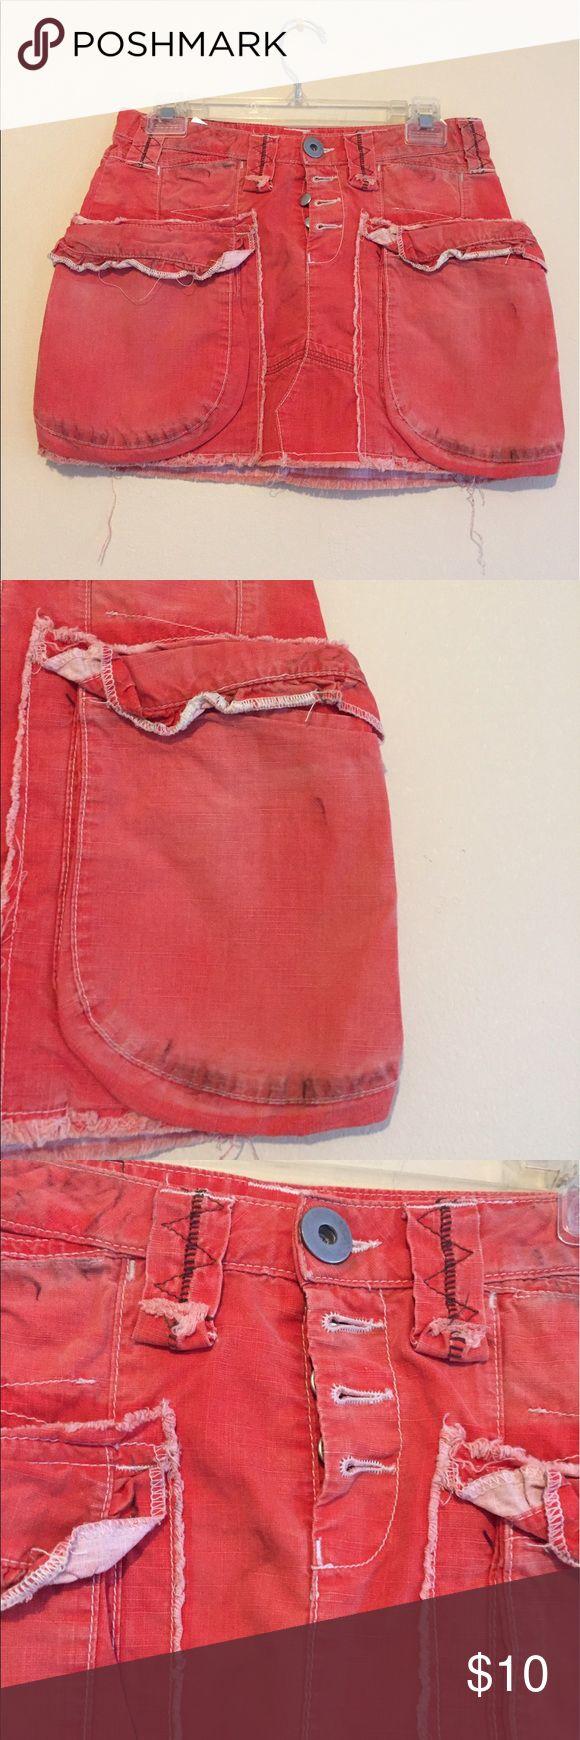 H&M orange Jean mini skirt H&M orange Jean mini skirt with big pockets and front buttons H&M Skirts Mini